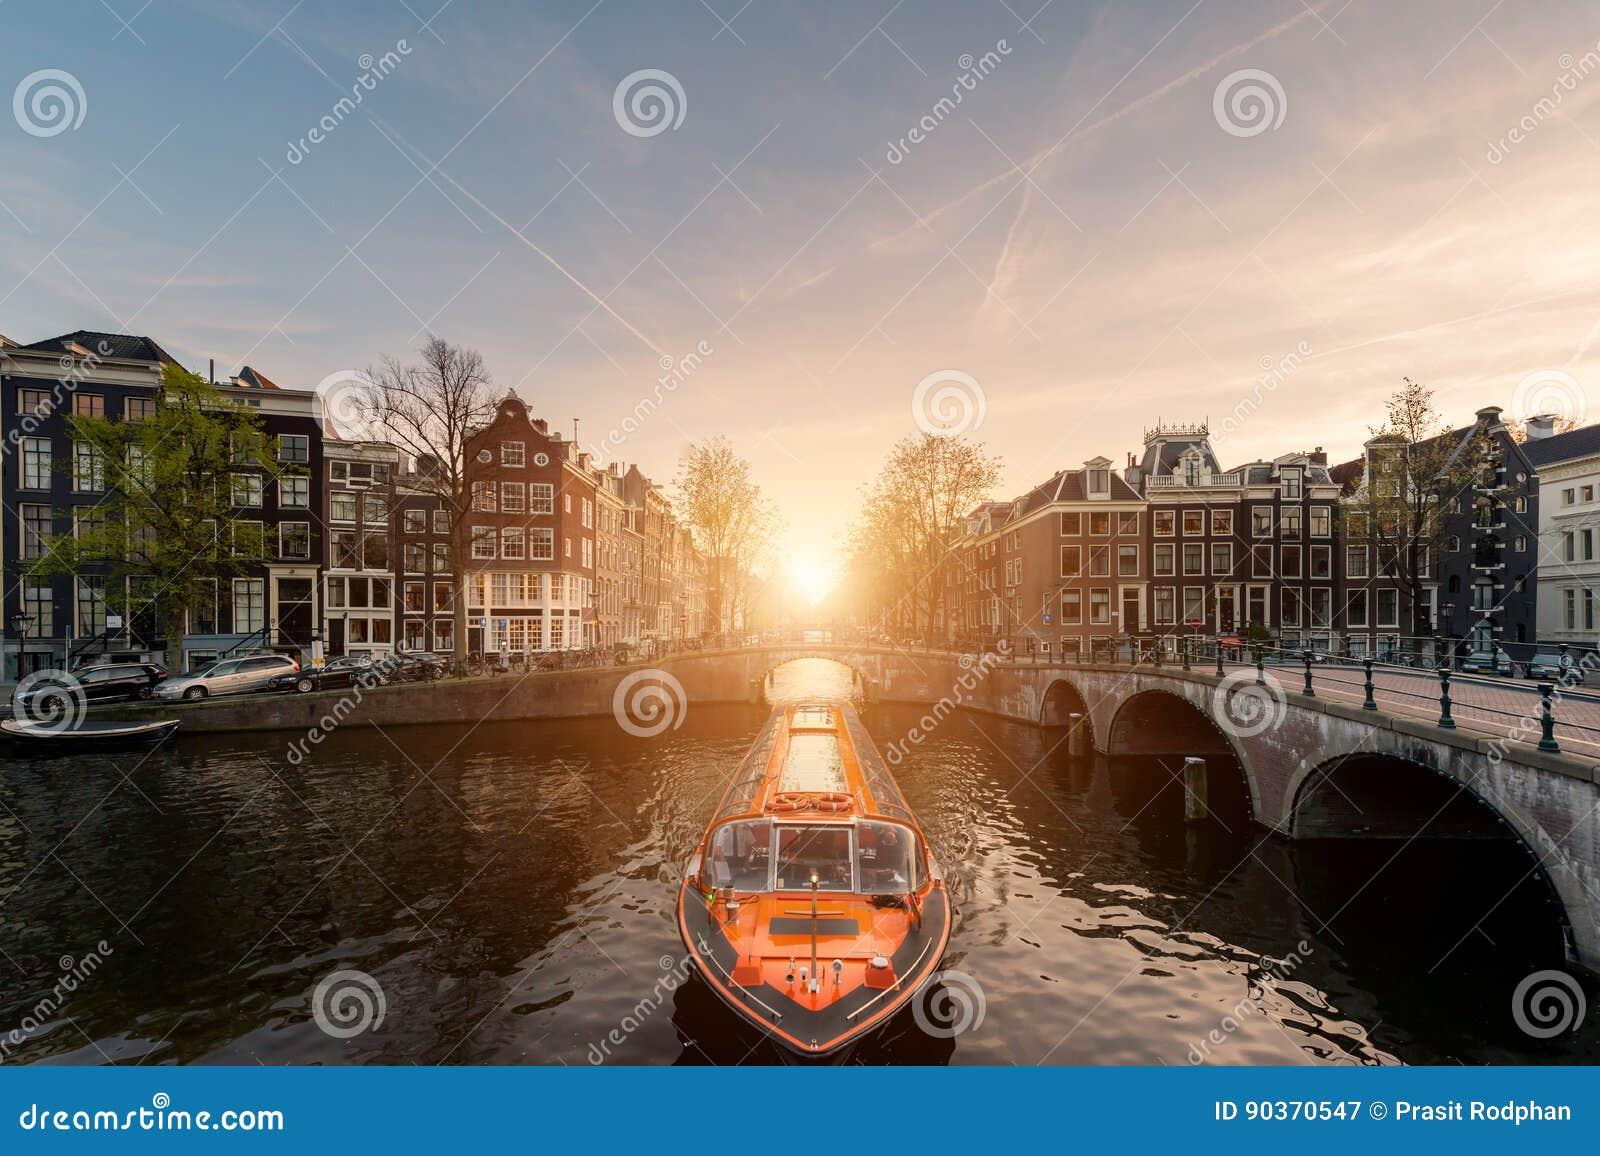 Туристическое судно канала Амстердама с нидерландским традиционным домом i